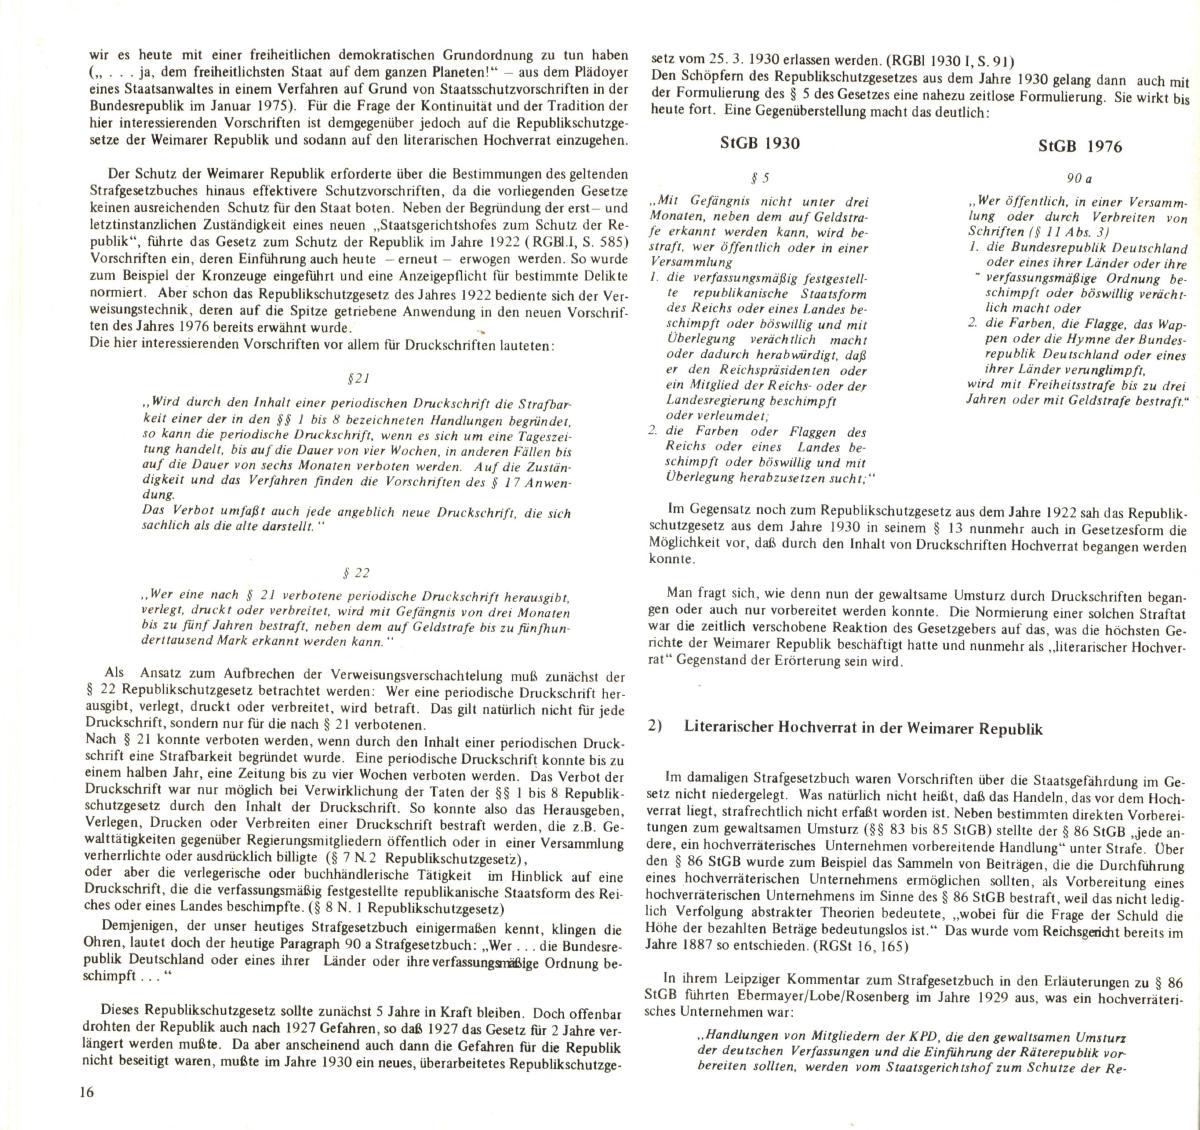 REP_VLB_1976_Die_Zensurgesetze_17